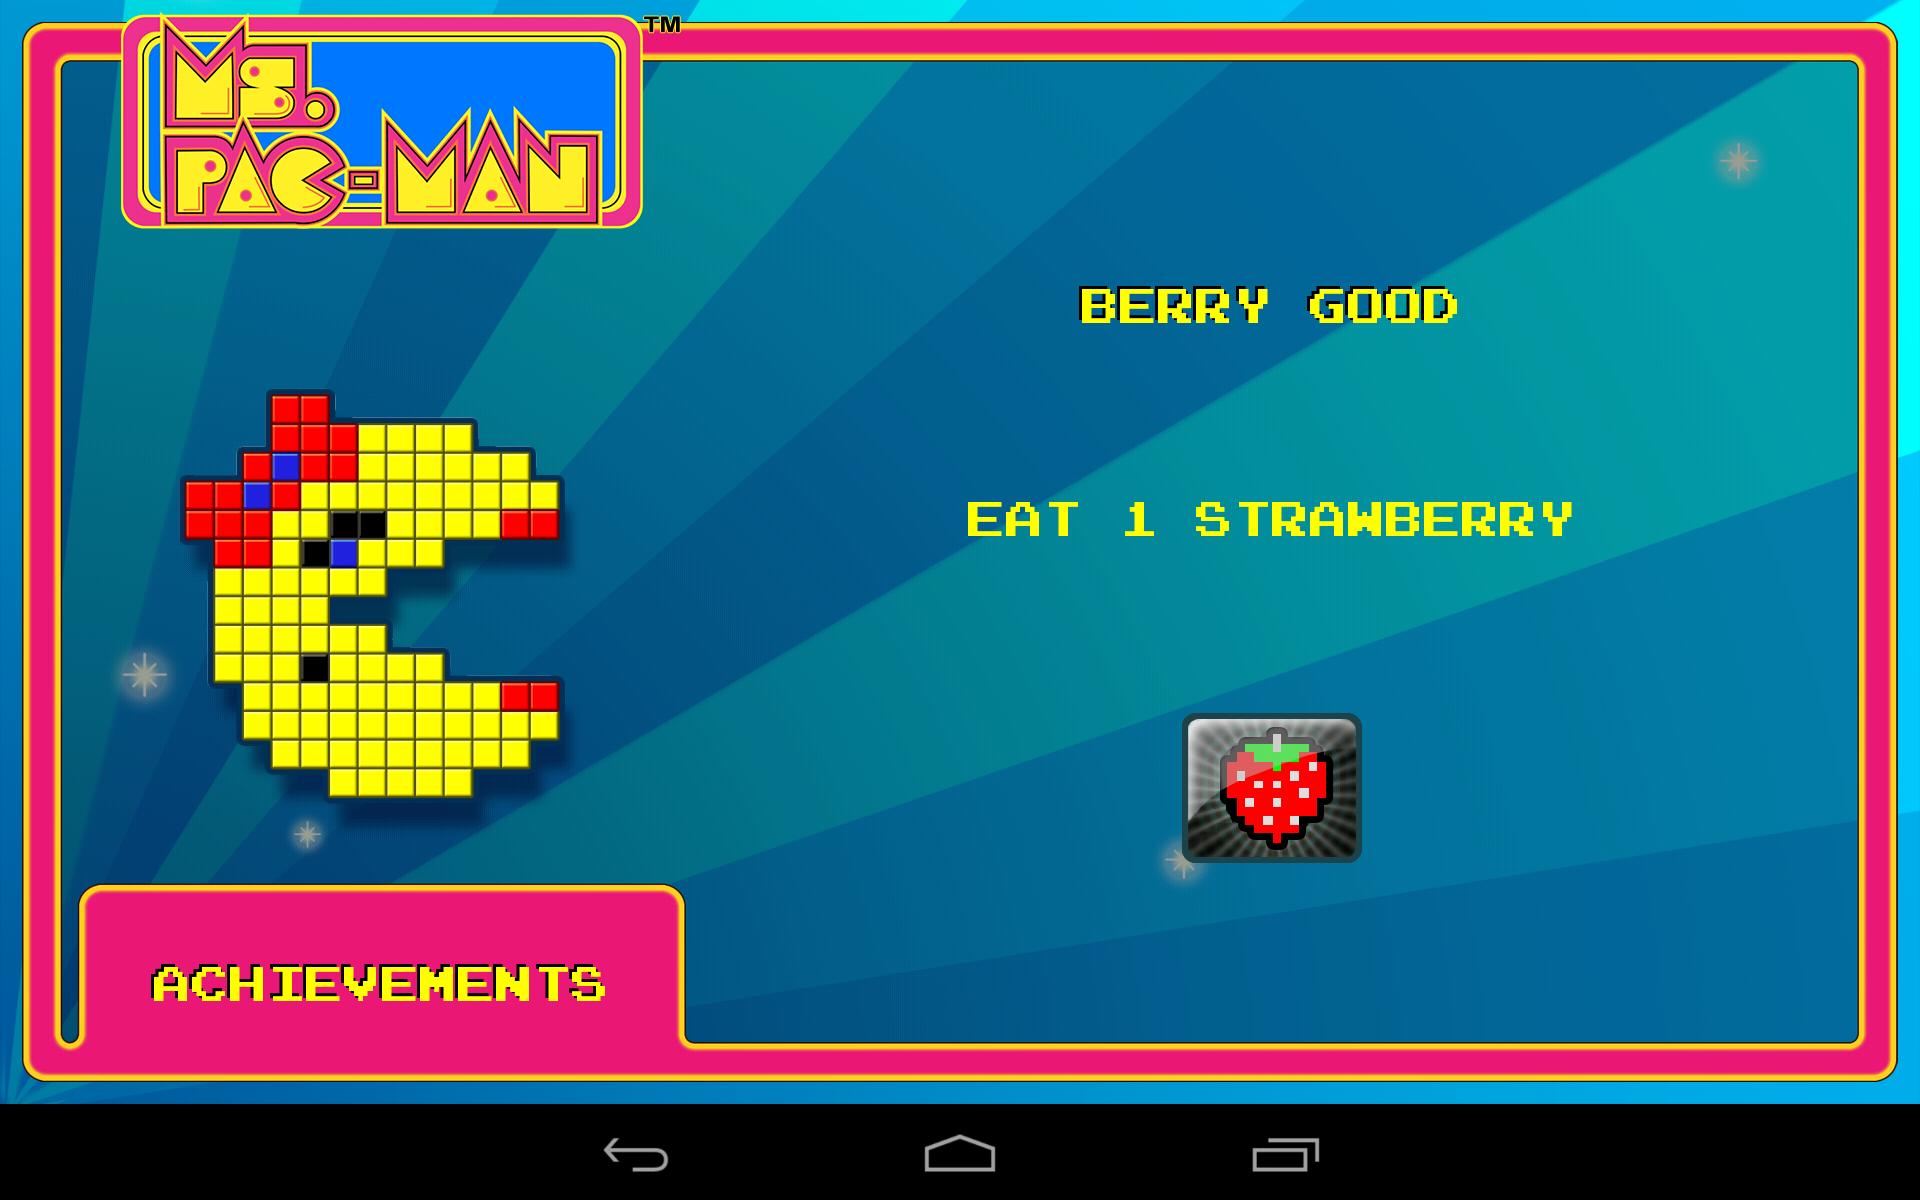 Ms. PAC-MAN by Namco screenshot #6